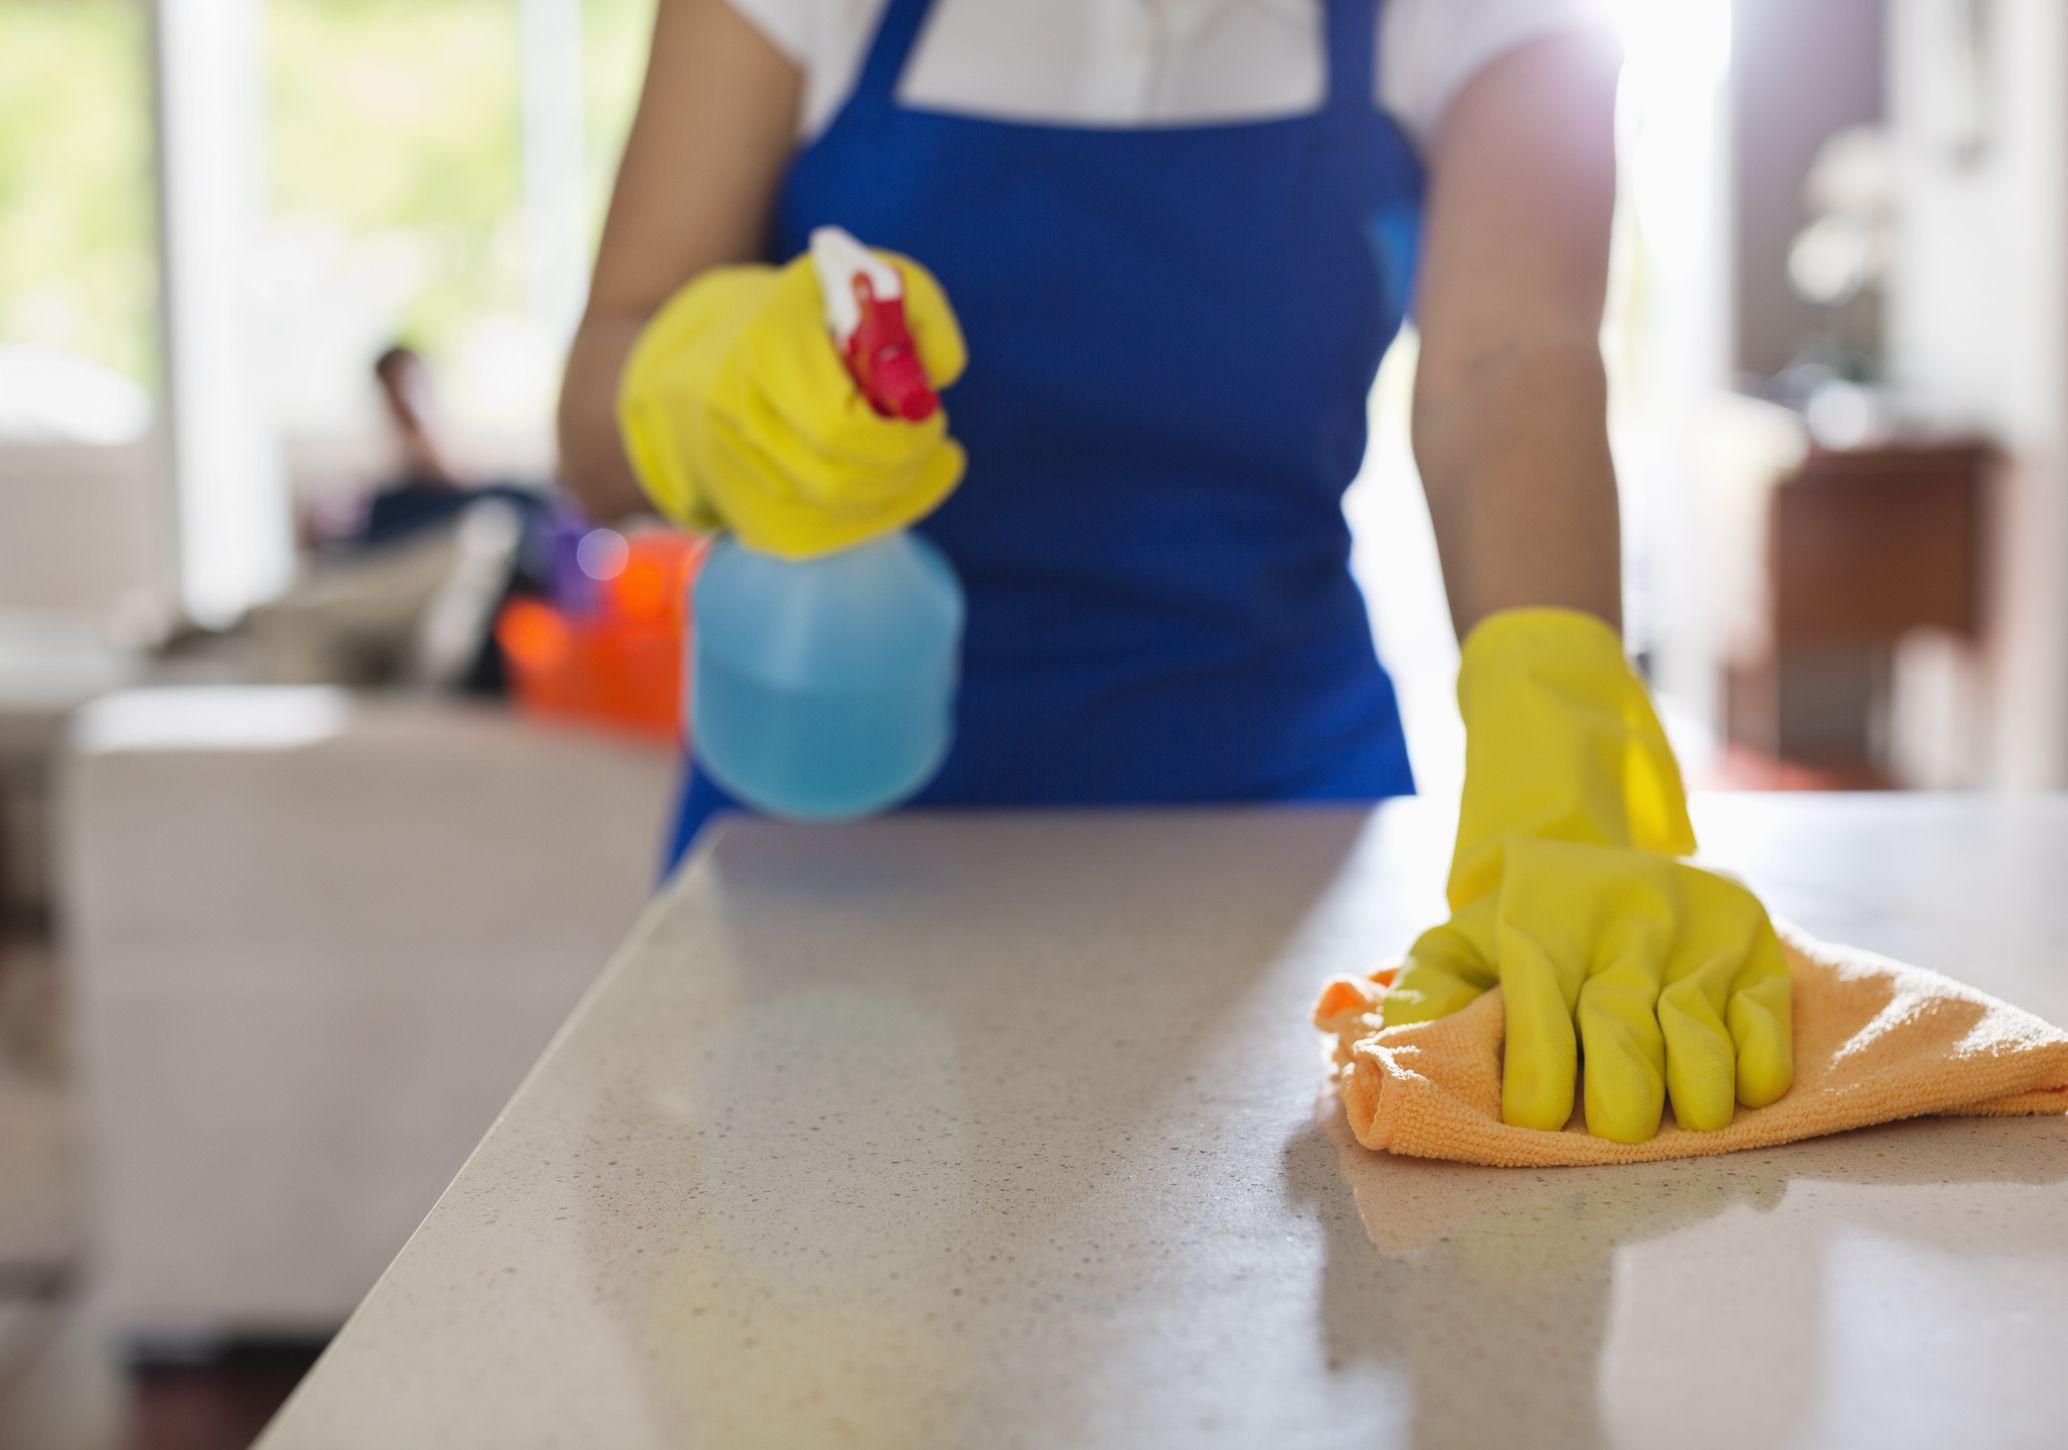 Cleaning Plastic Laminate Countertop